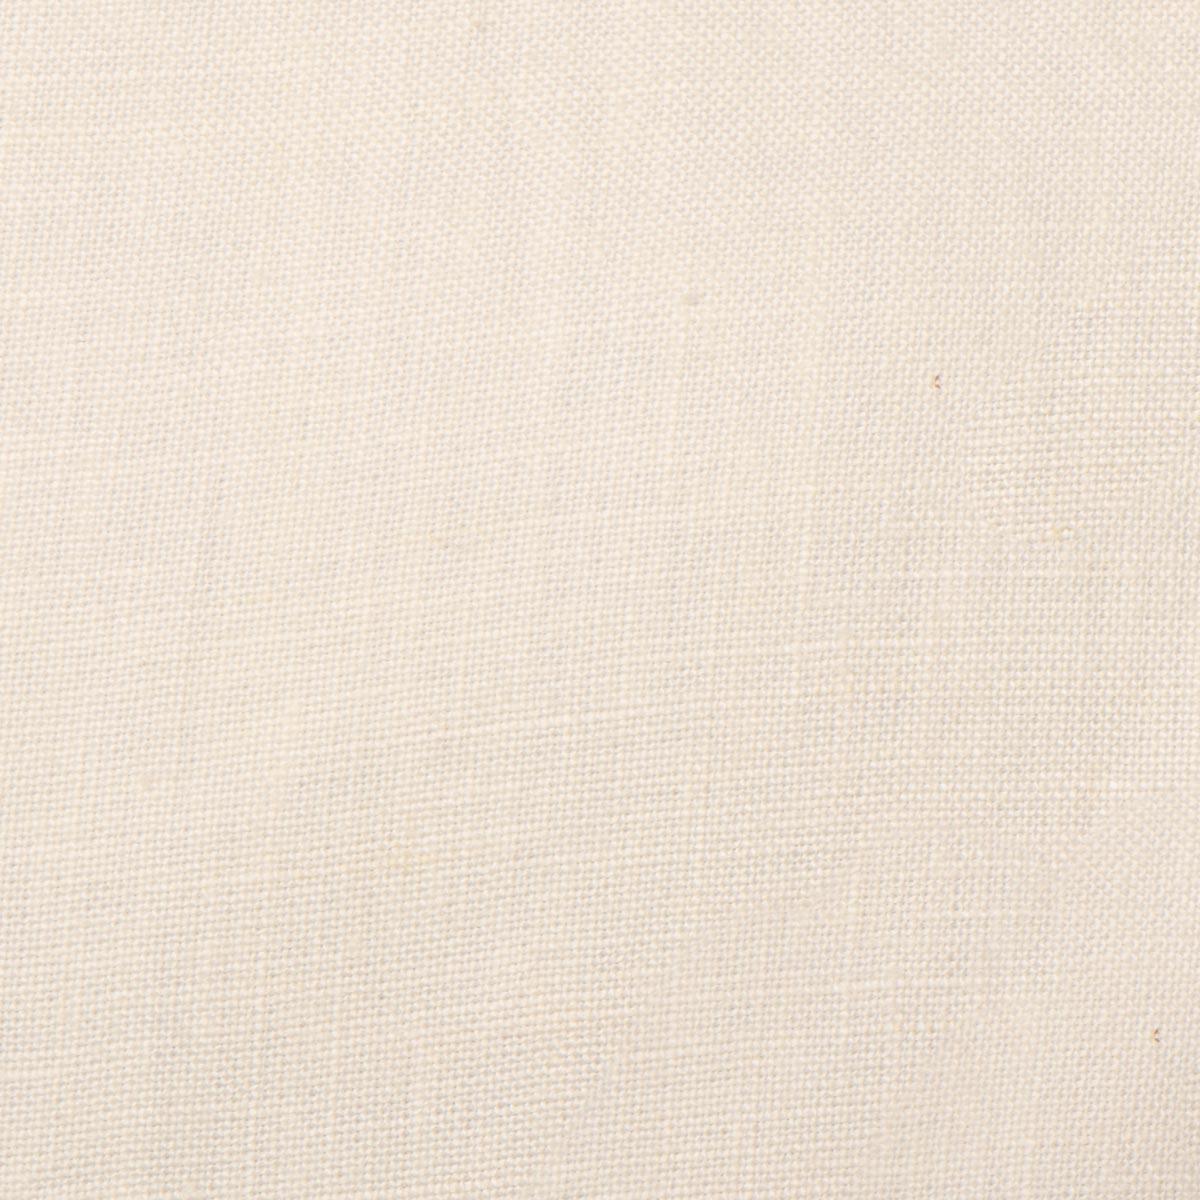 fc295-903023-fabric.jpg